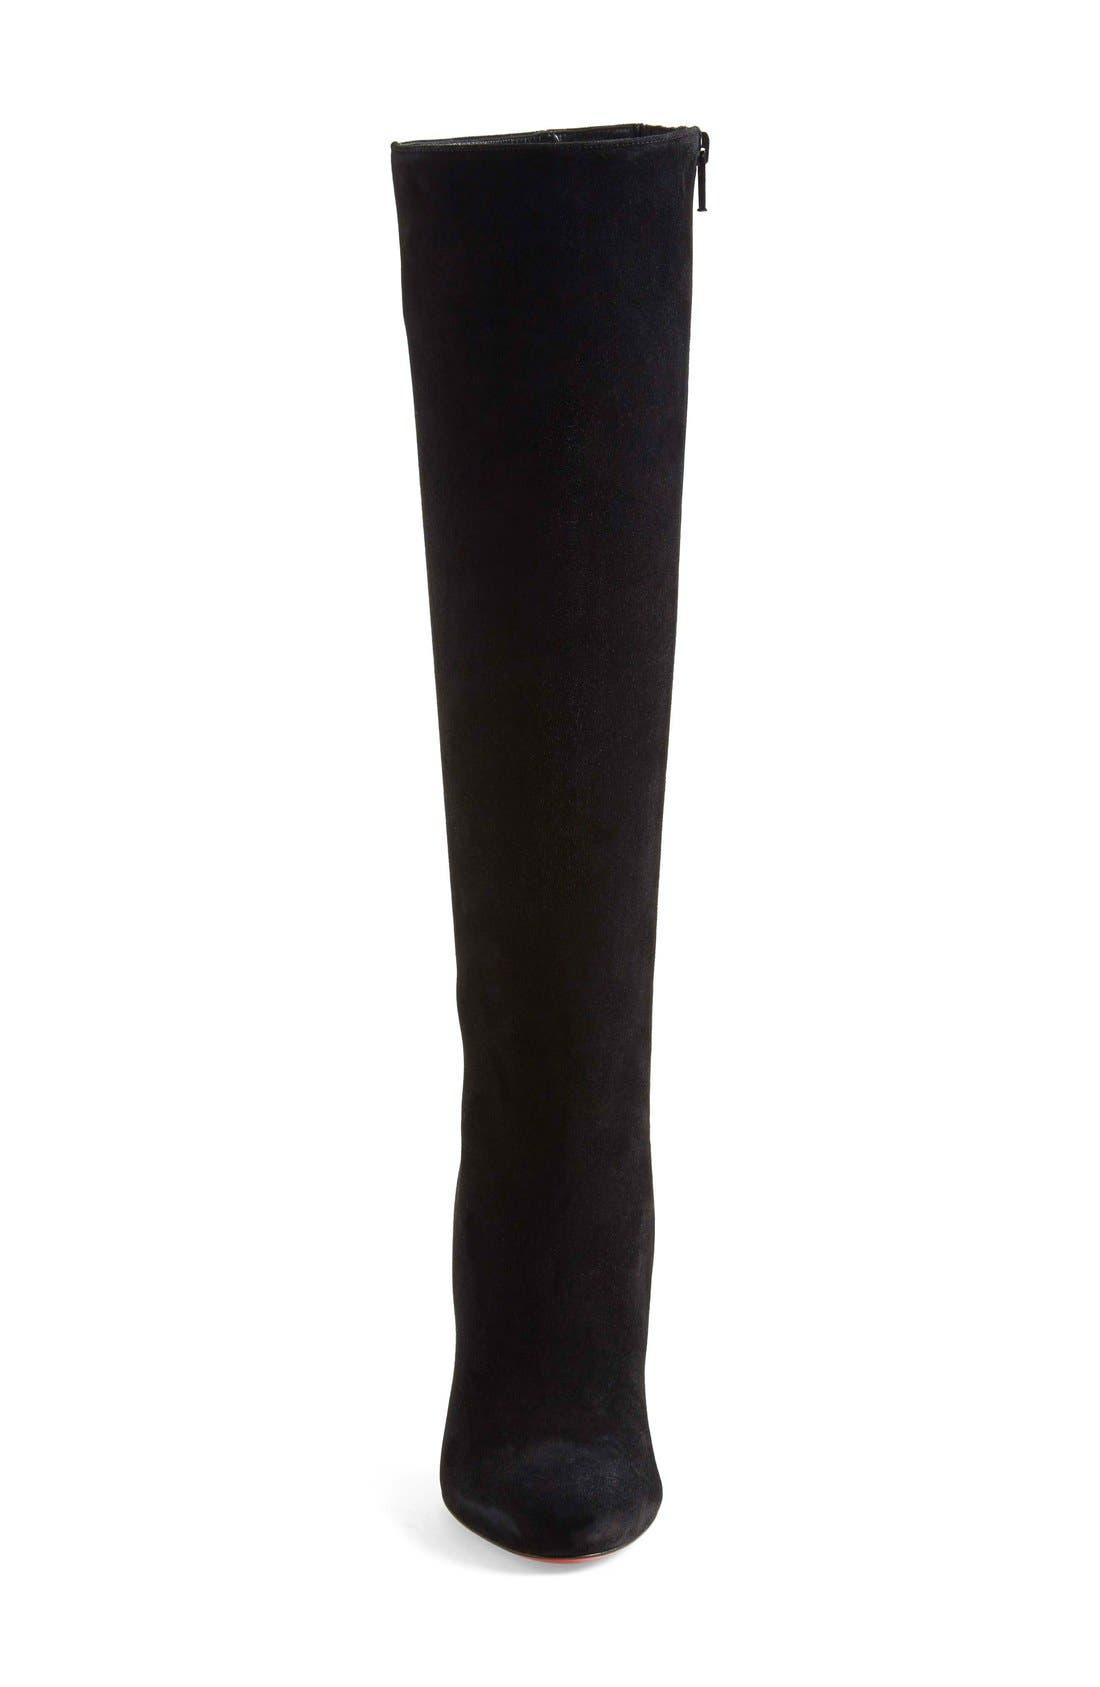 Alternate Image 3  - Christian Louboutin 'Fifi' Tall Boot